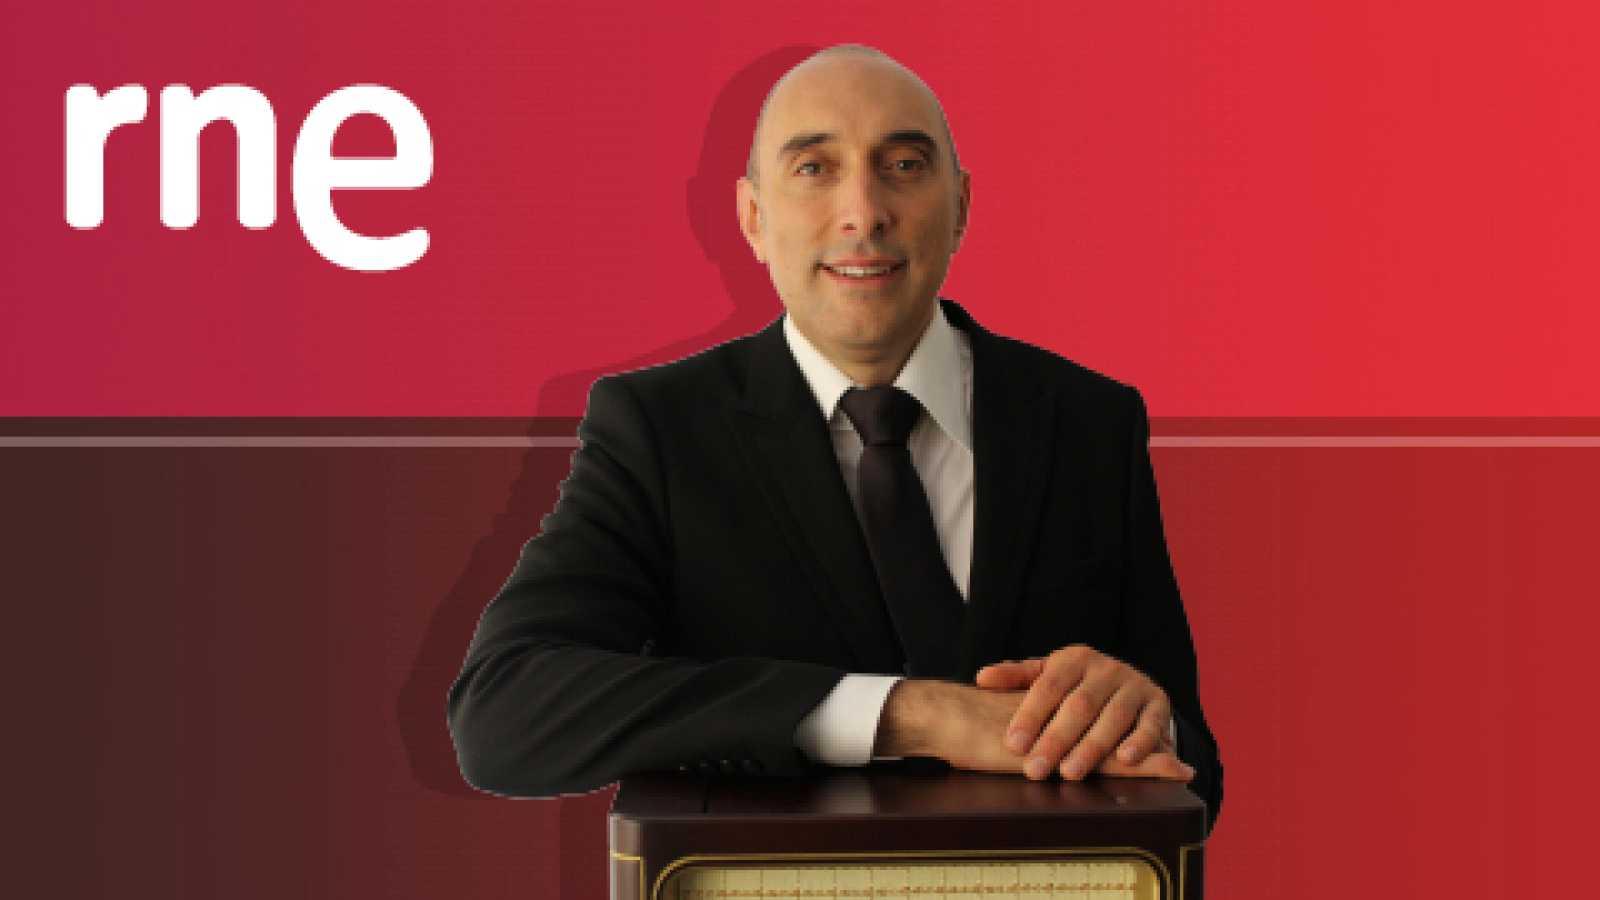 LLUIS SERRA MAJEM, candidato a rector de la Universidad de Las Palmas de Gran Canaria - Escuchar ahora